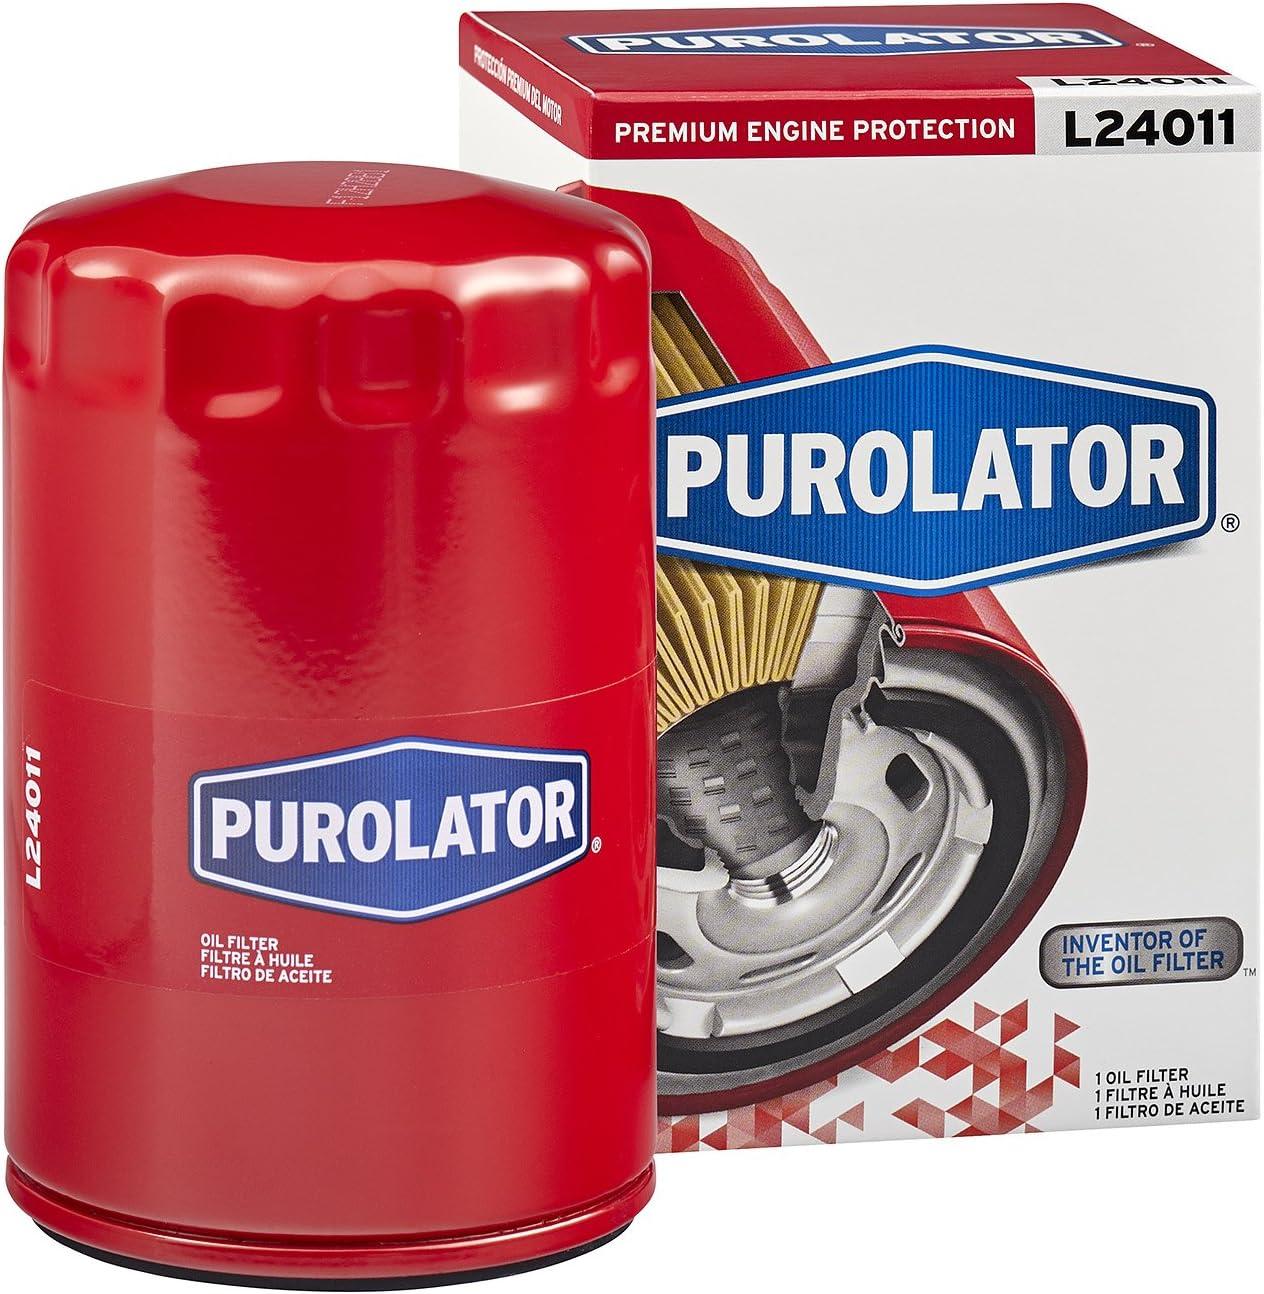 Engine Oil Filter Purolator L25401